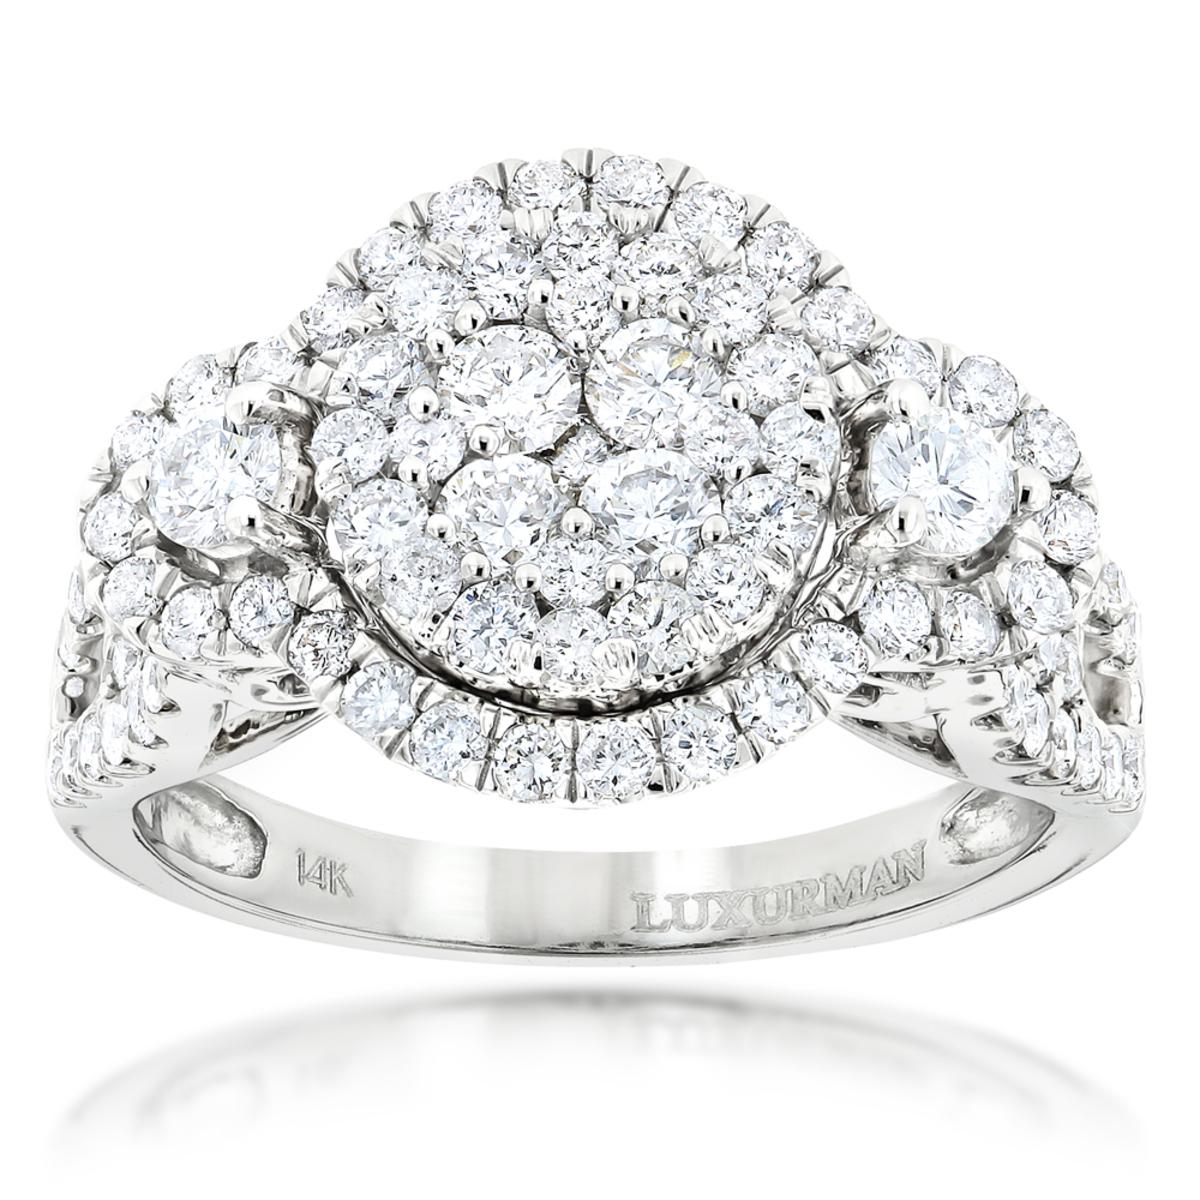 2 Carat Diamond Engagement Ring Cluster Set Diamonds 14k Gold by Luxurman